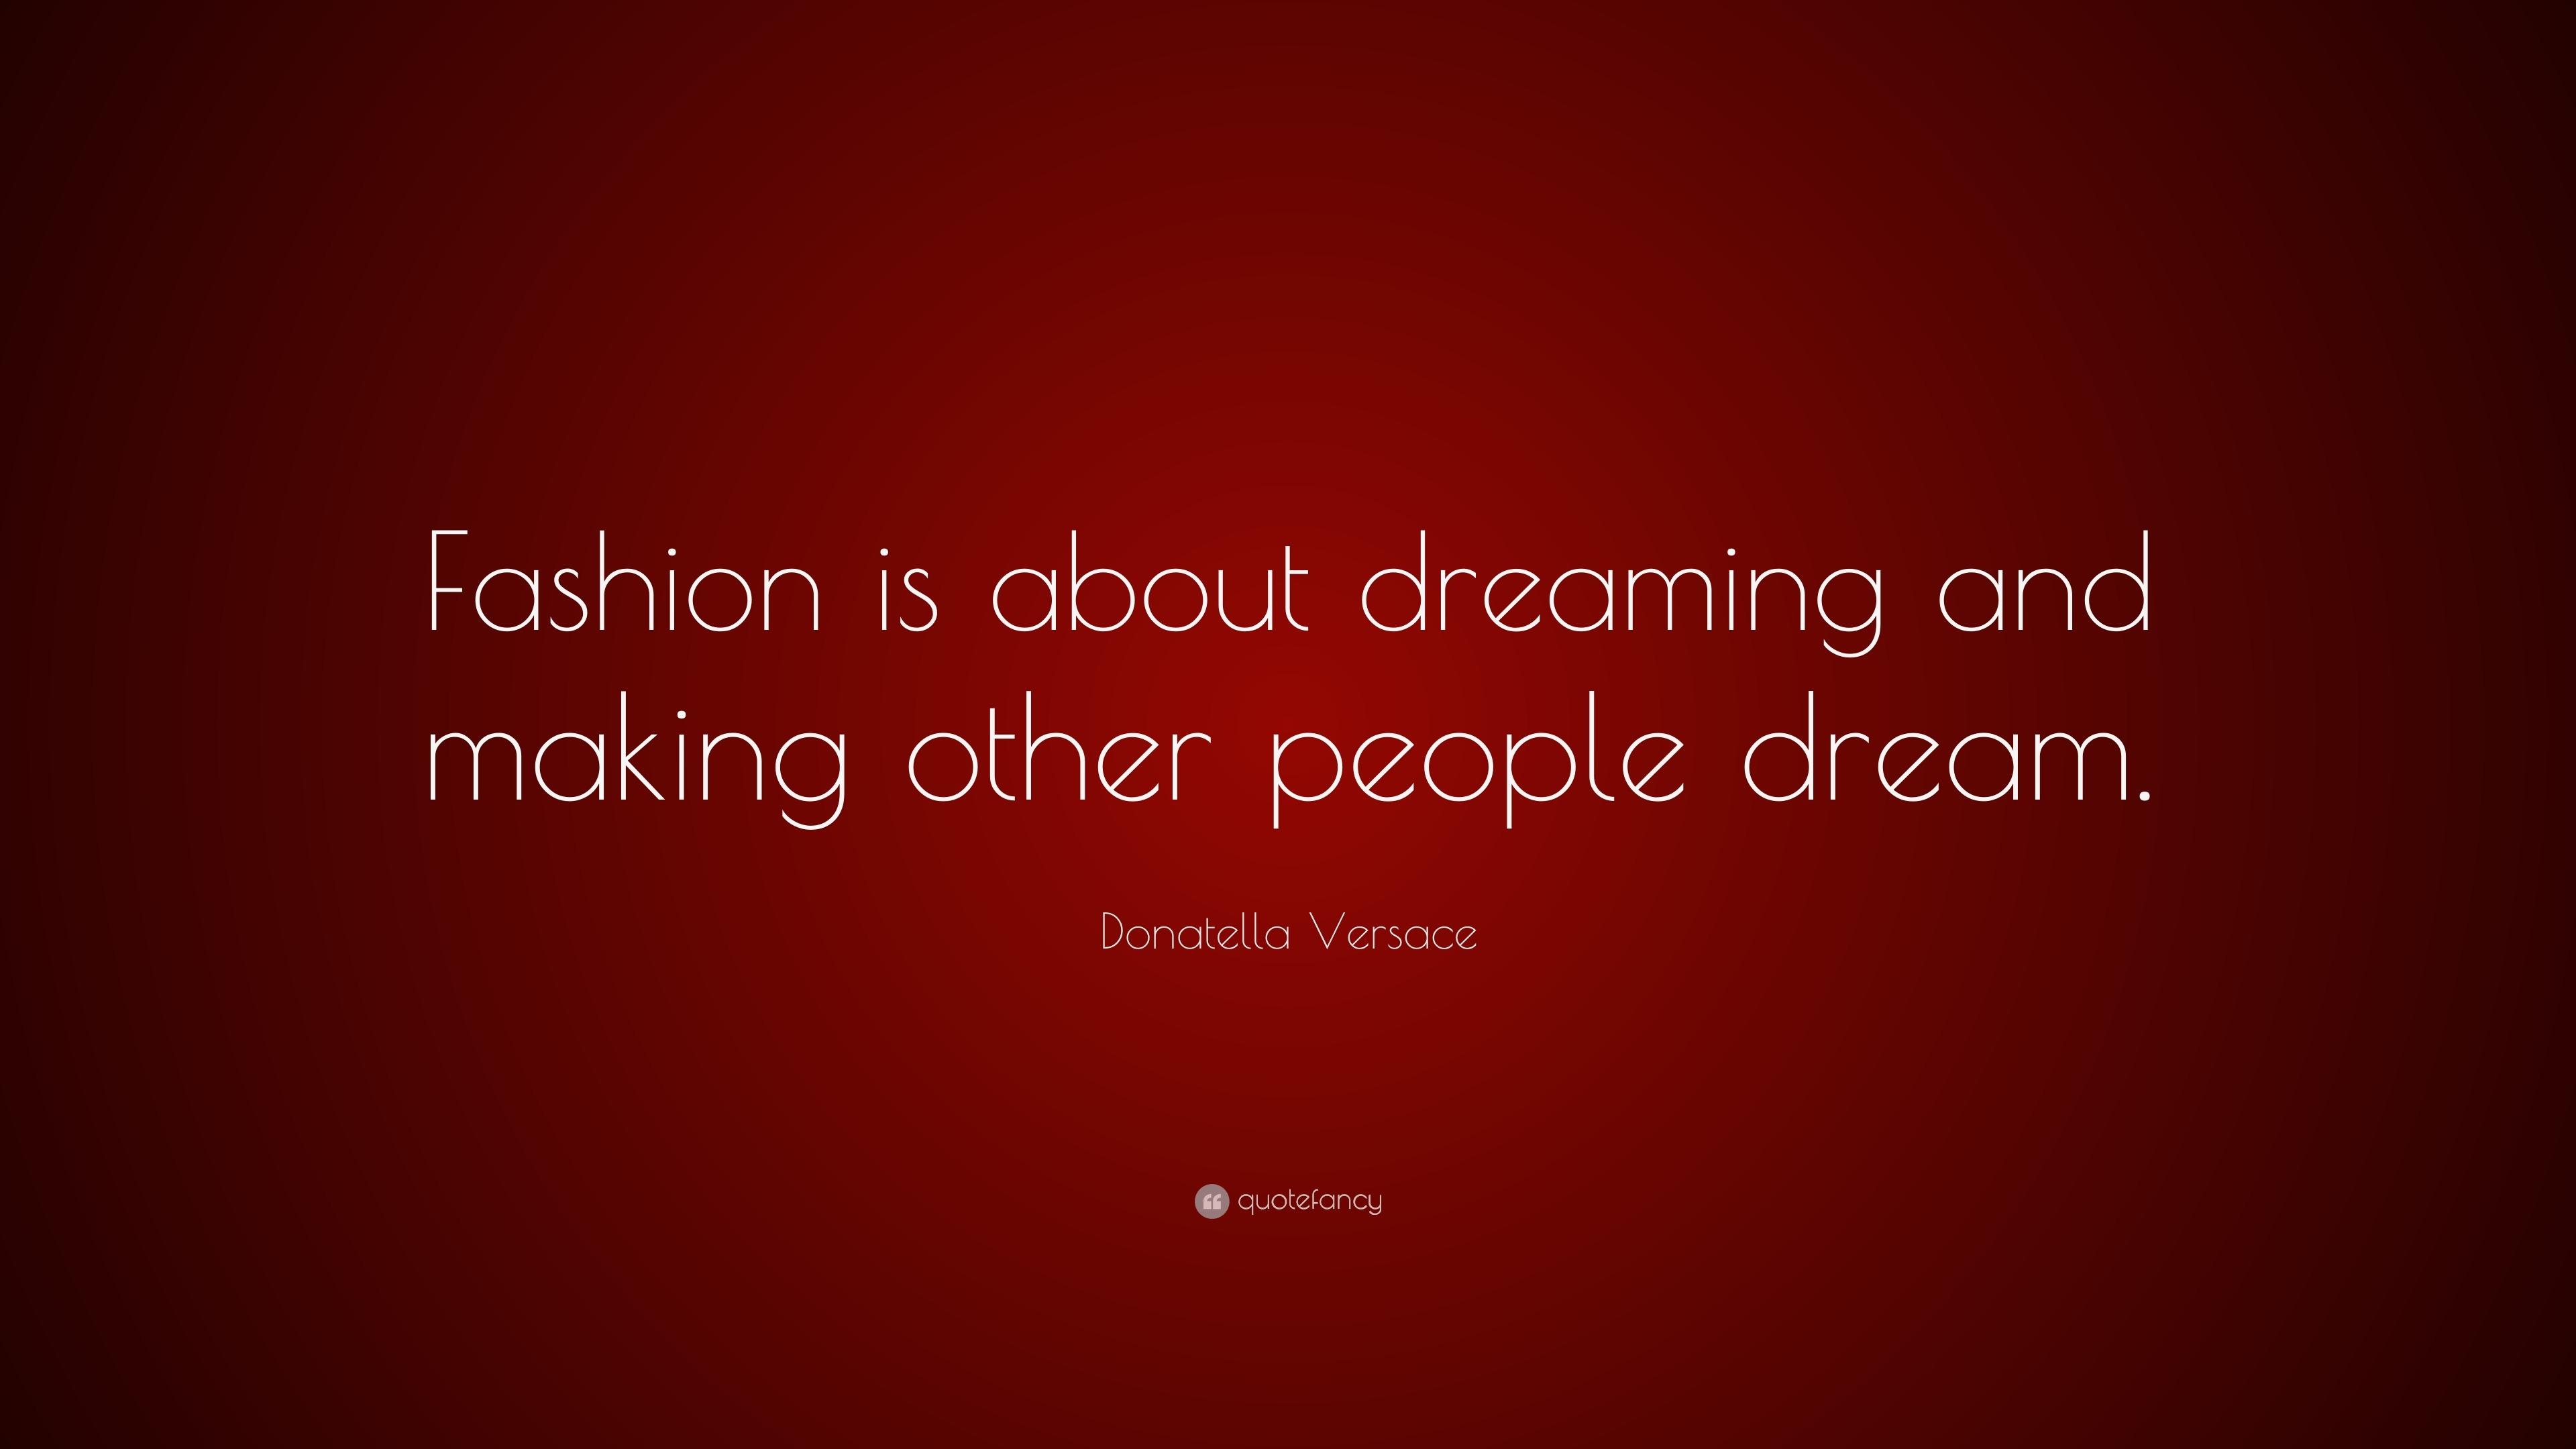 Donatella Versace Quotes 93 Wallpapers Quotefancy